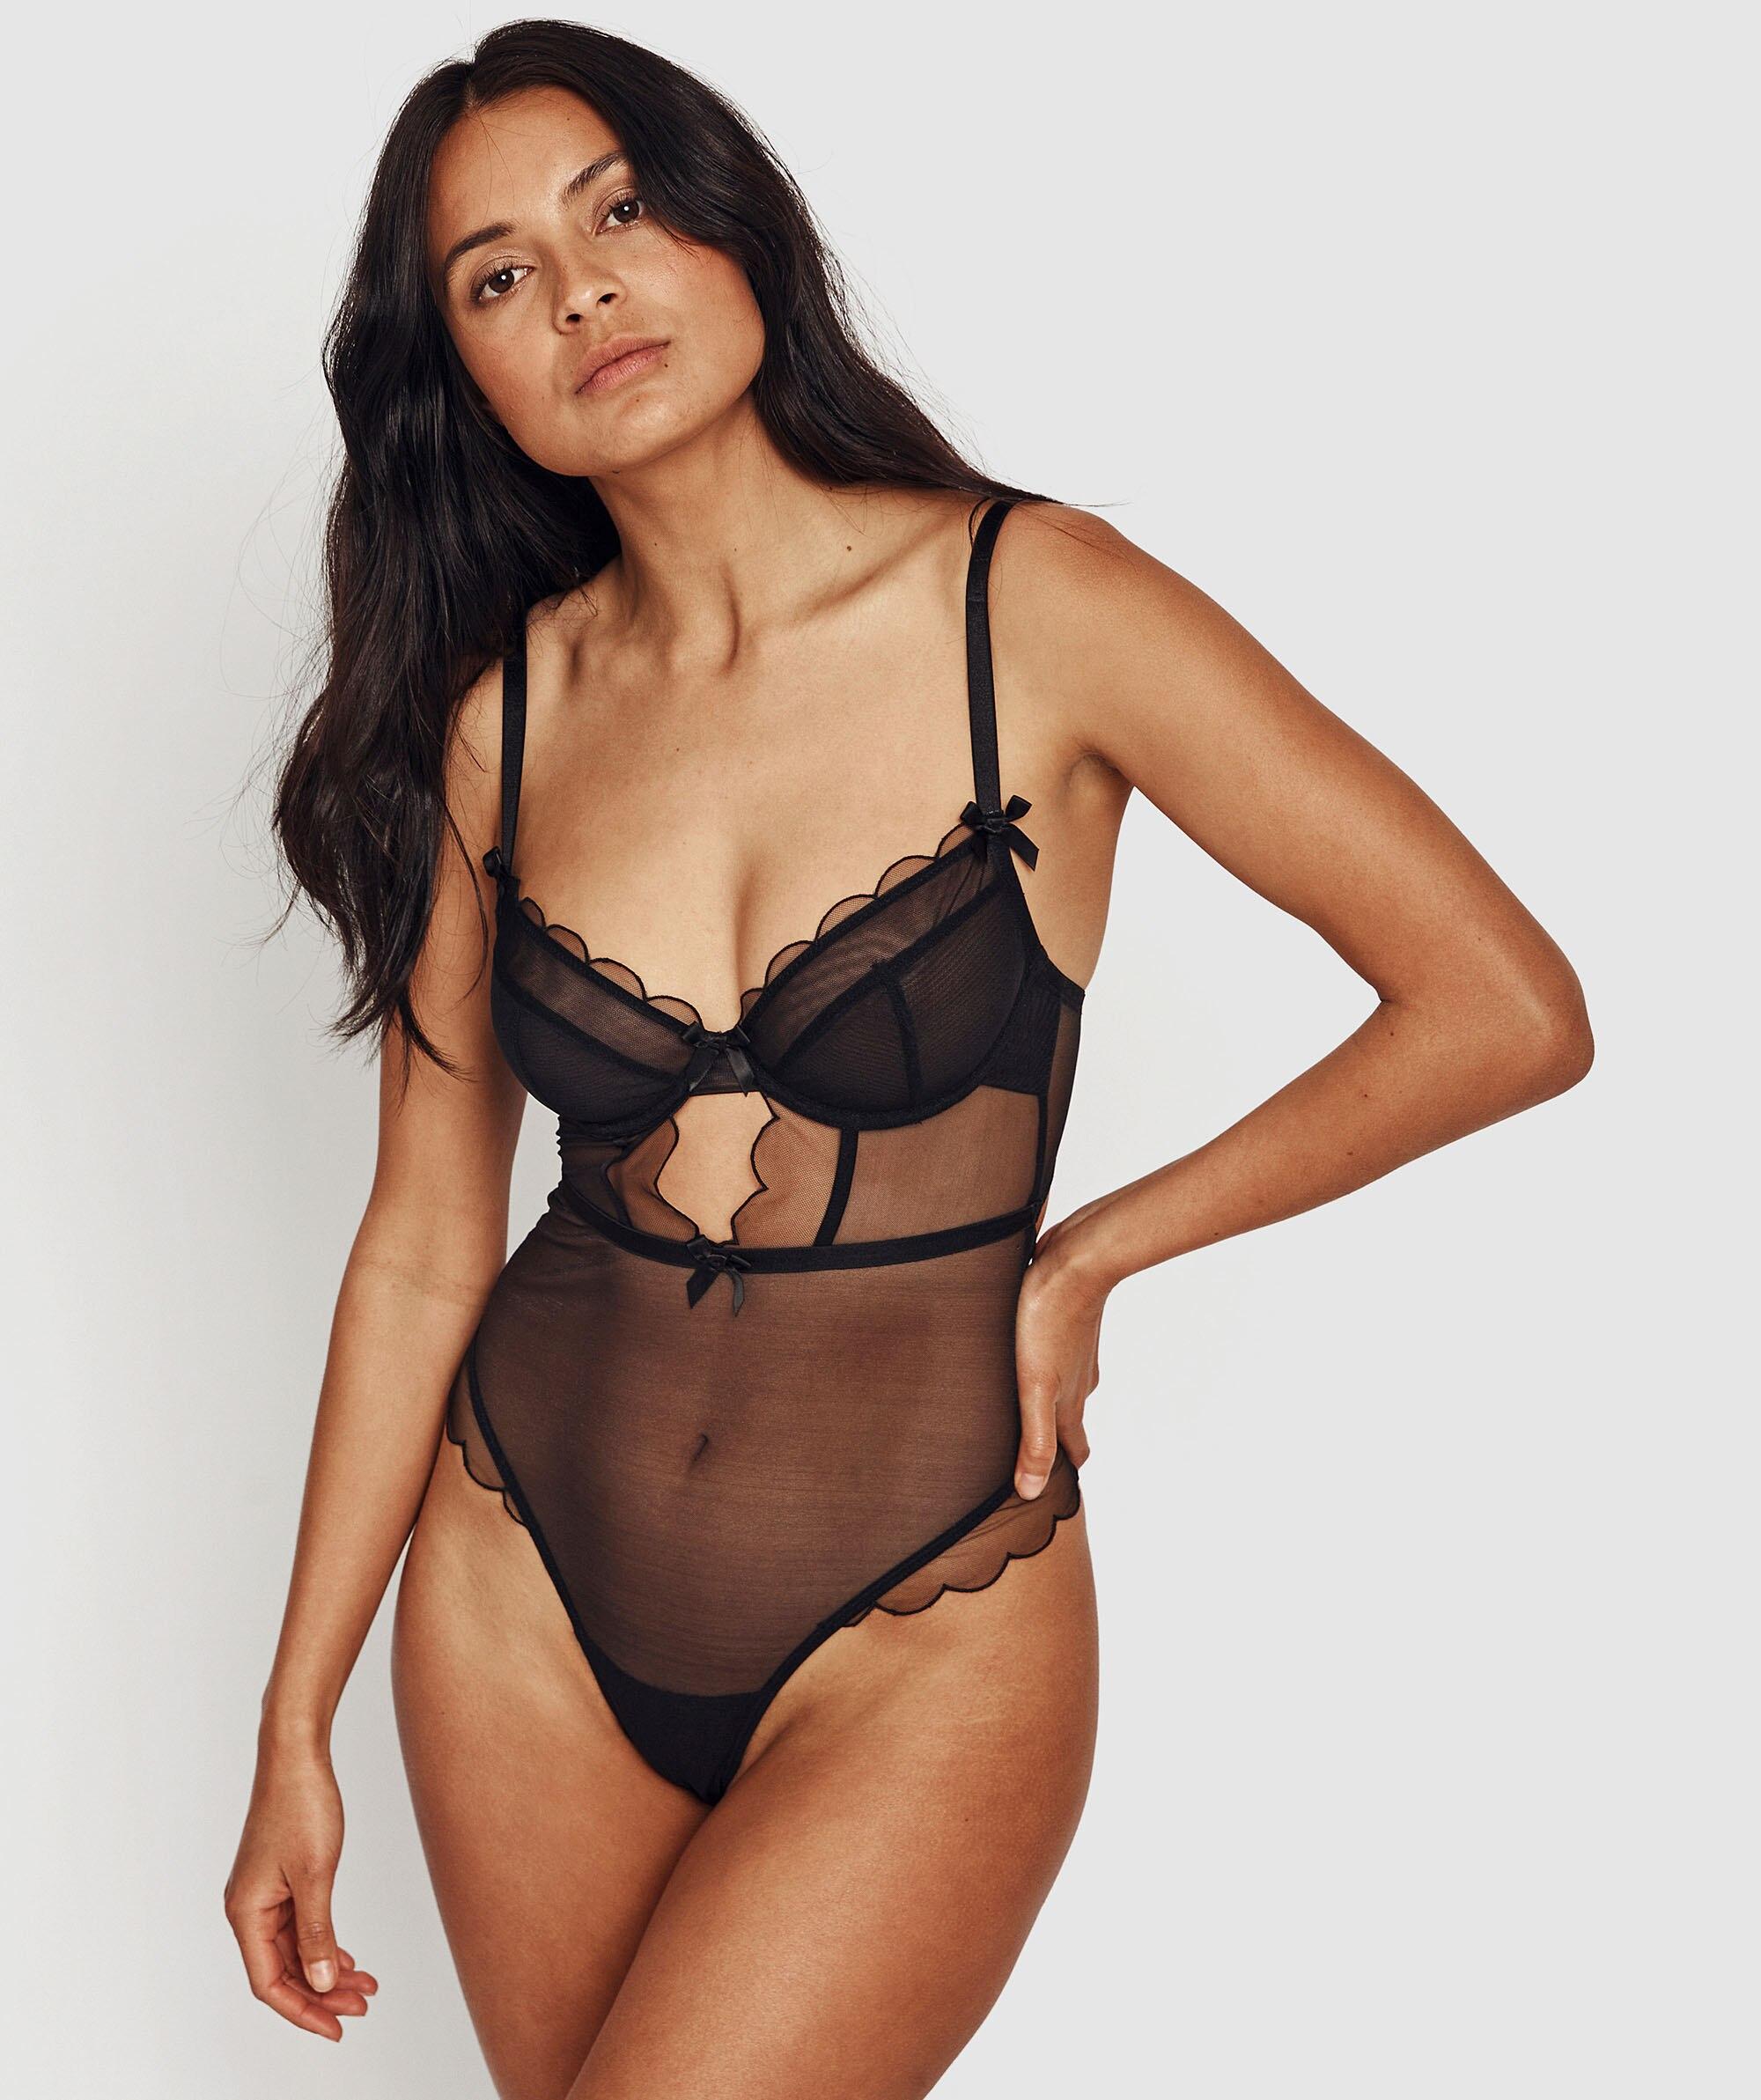 Not So Cute Bodysuit - Black